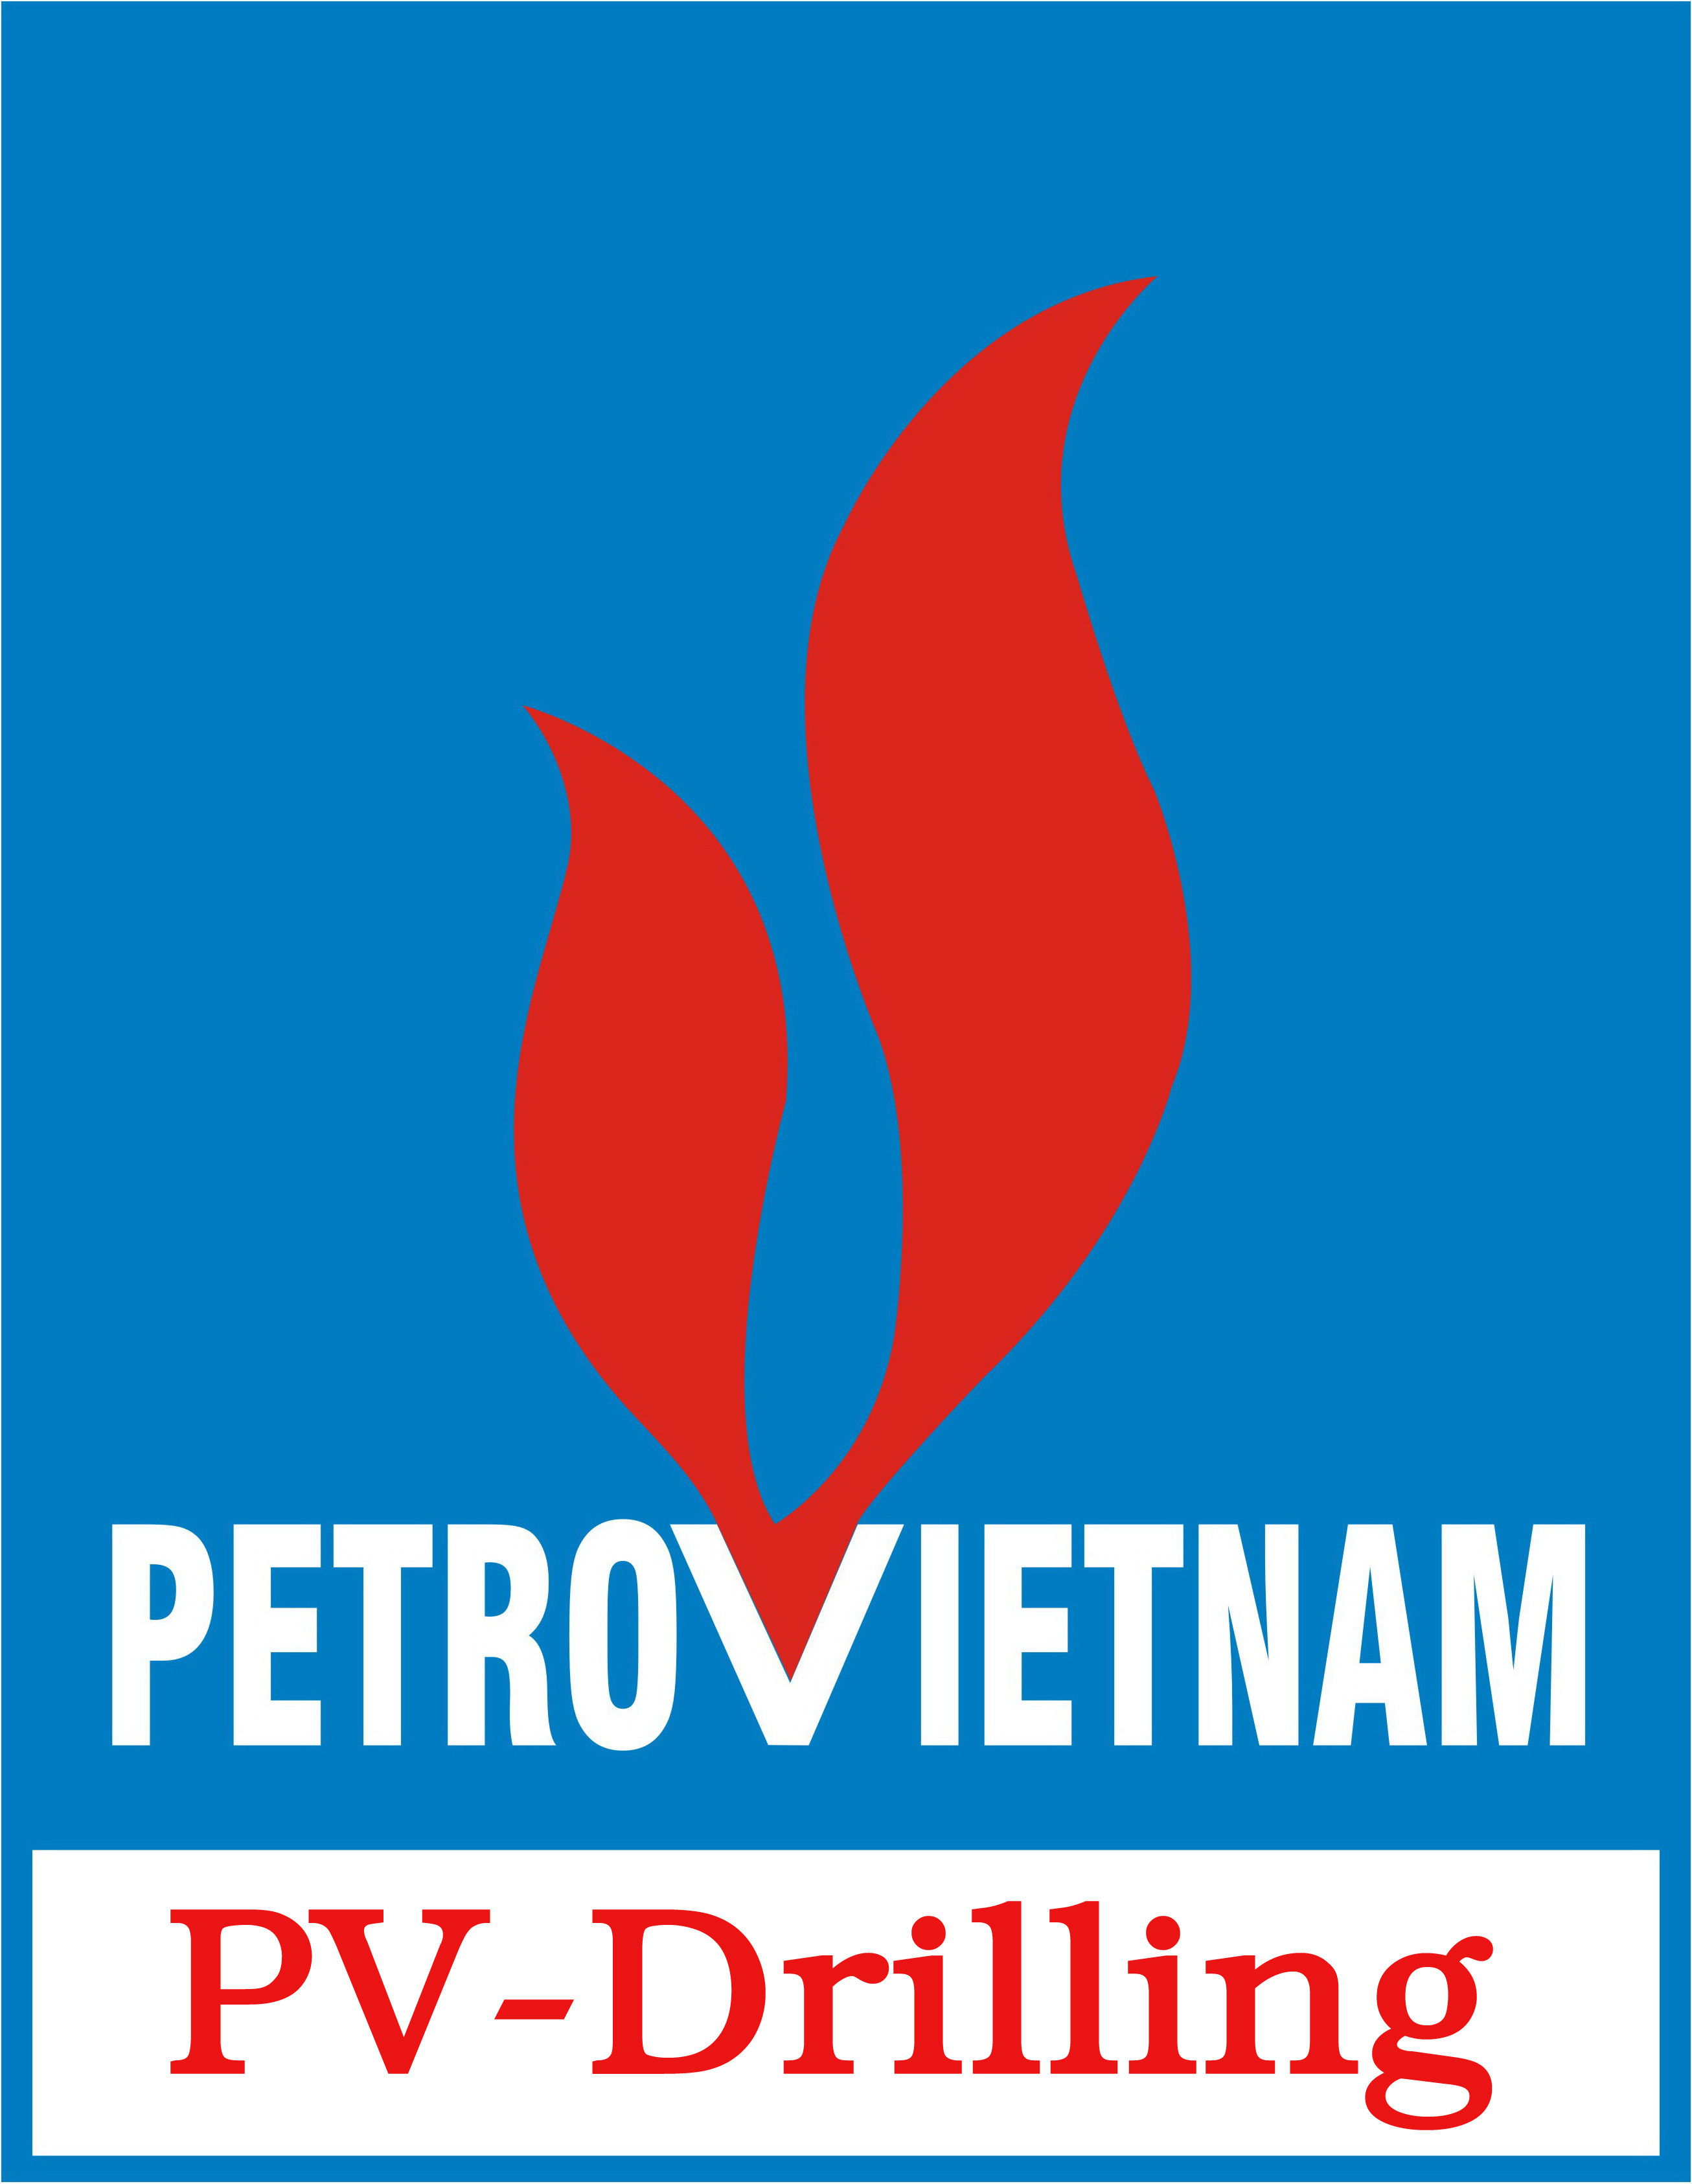 logo PV Drilling